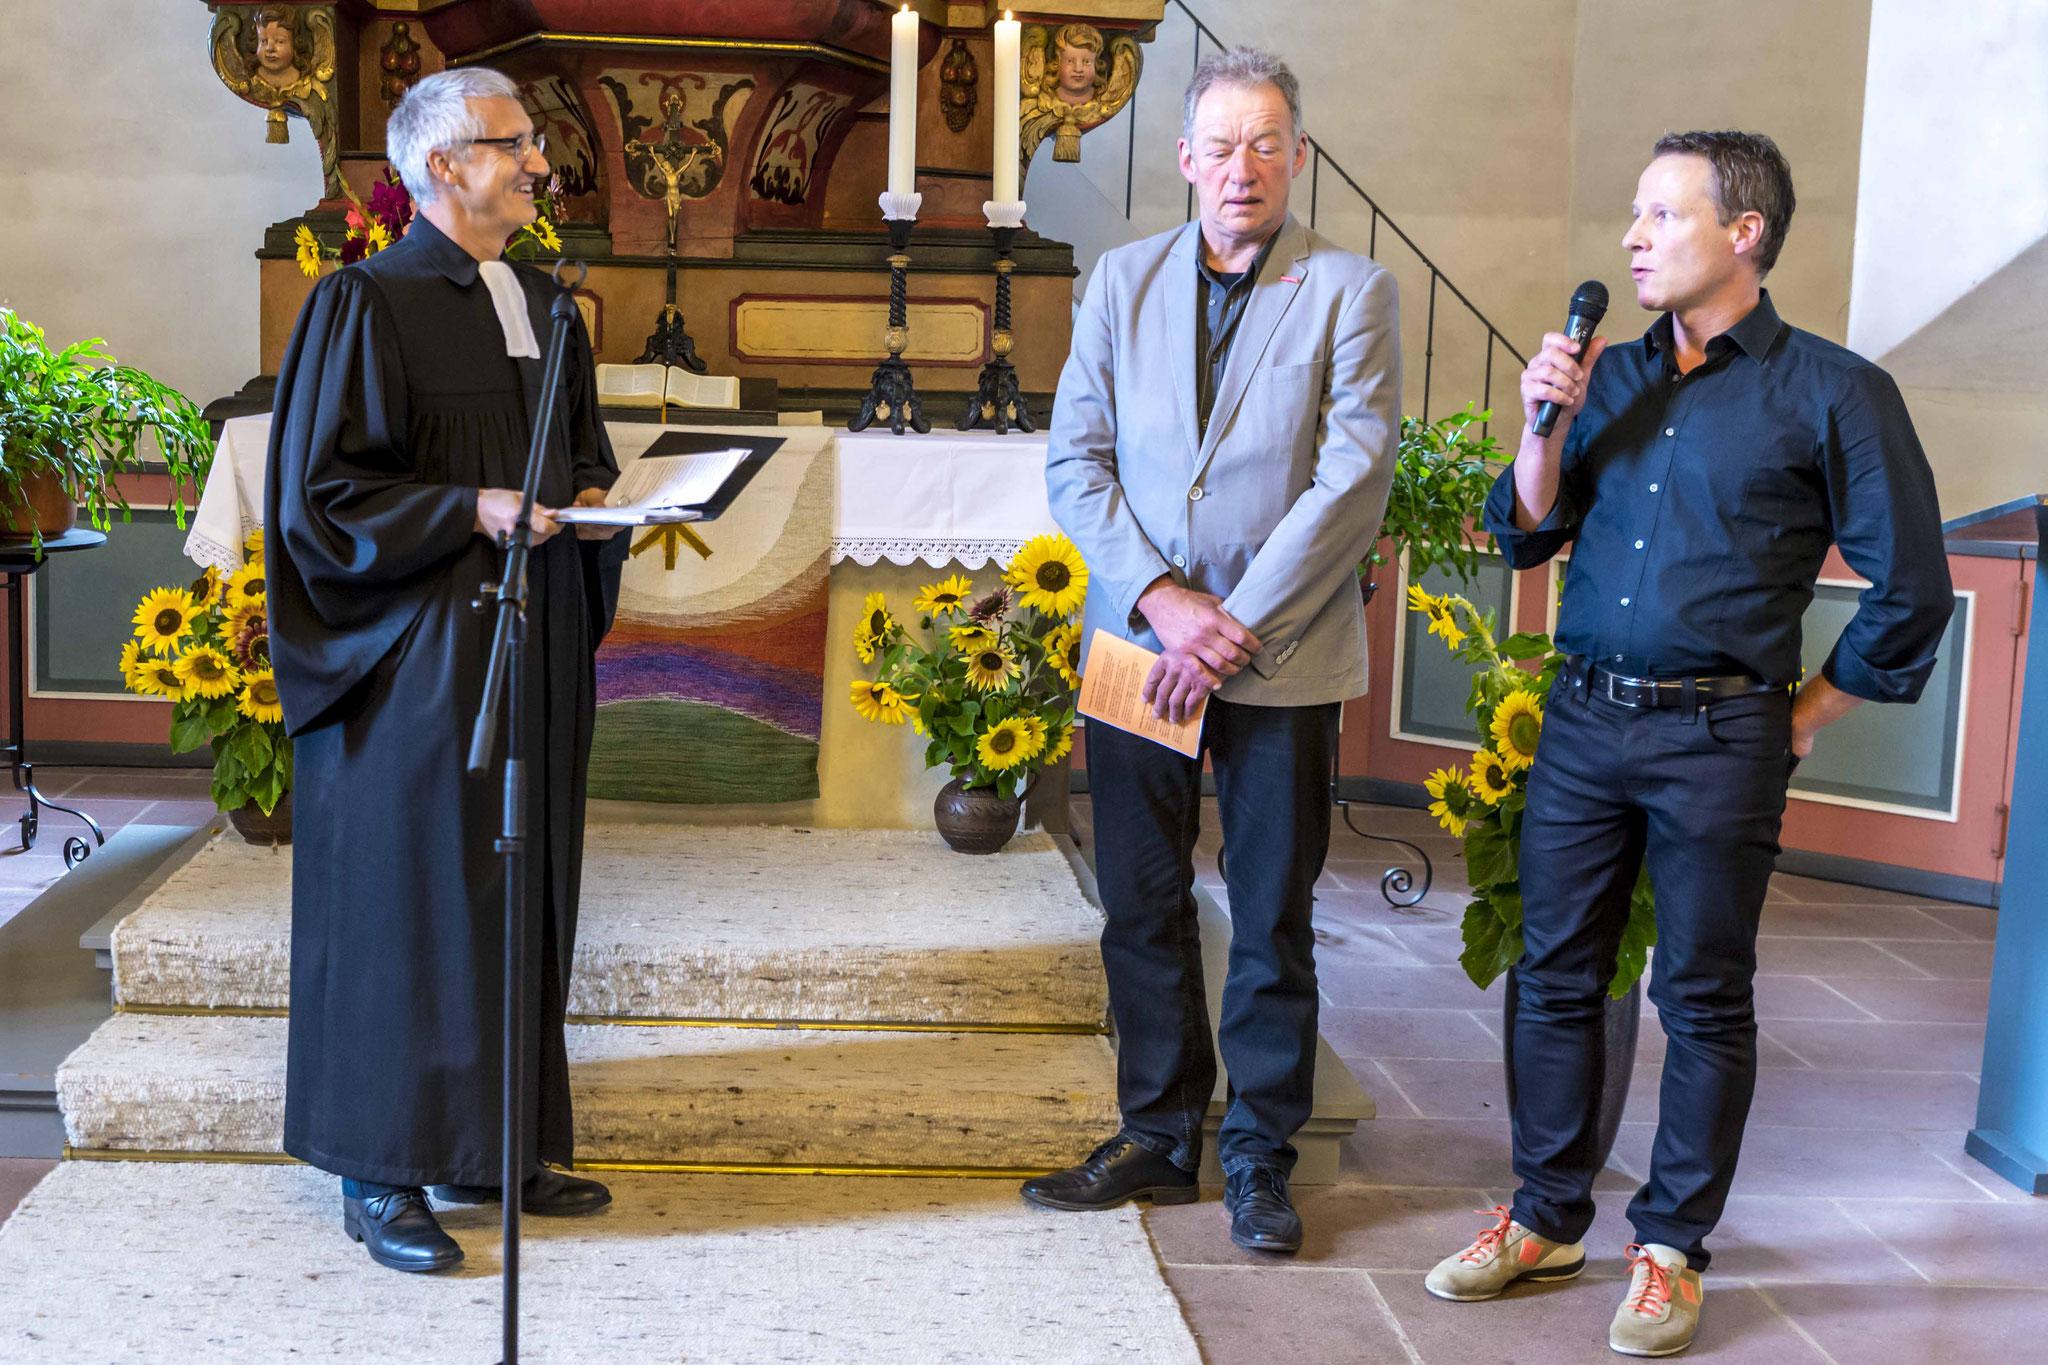 Pfarrer Dr. Jochen Gerlach (v.l.n.r.) interviewter Kfz.-Meister Alfred Schüttler und Bäckermeister Dirk Weber